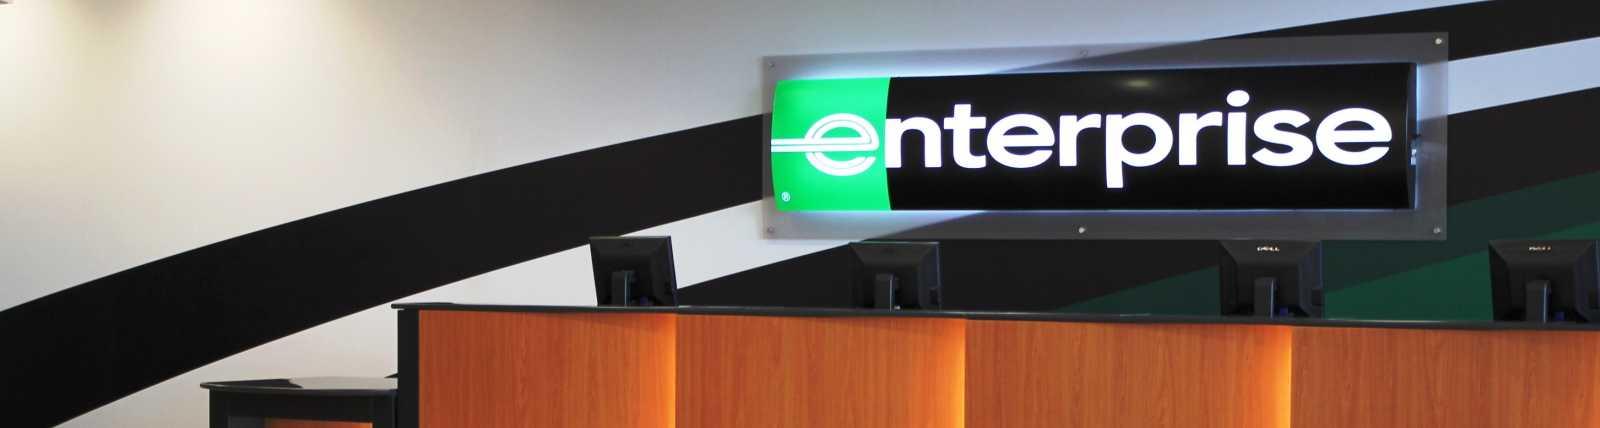 Enterprise_Rent-A-Car-2.JPG